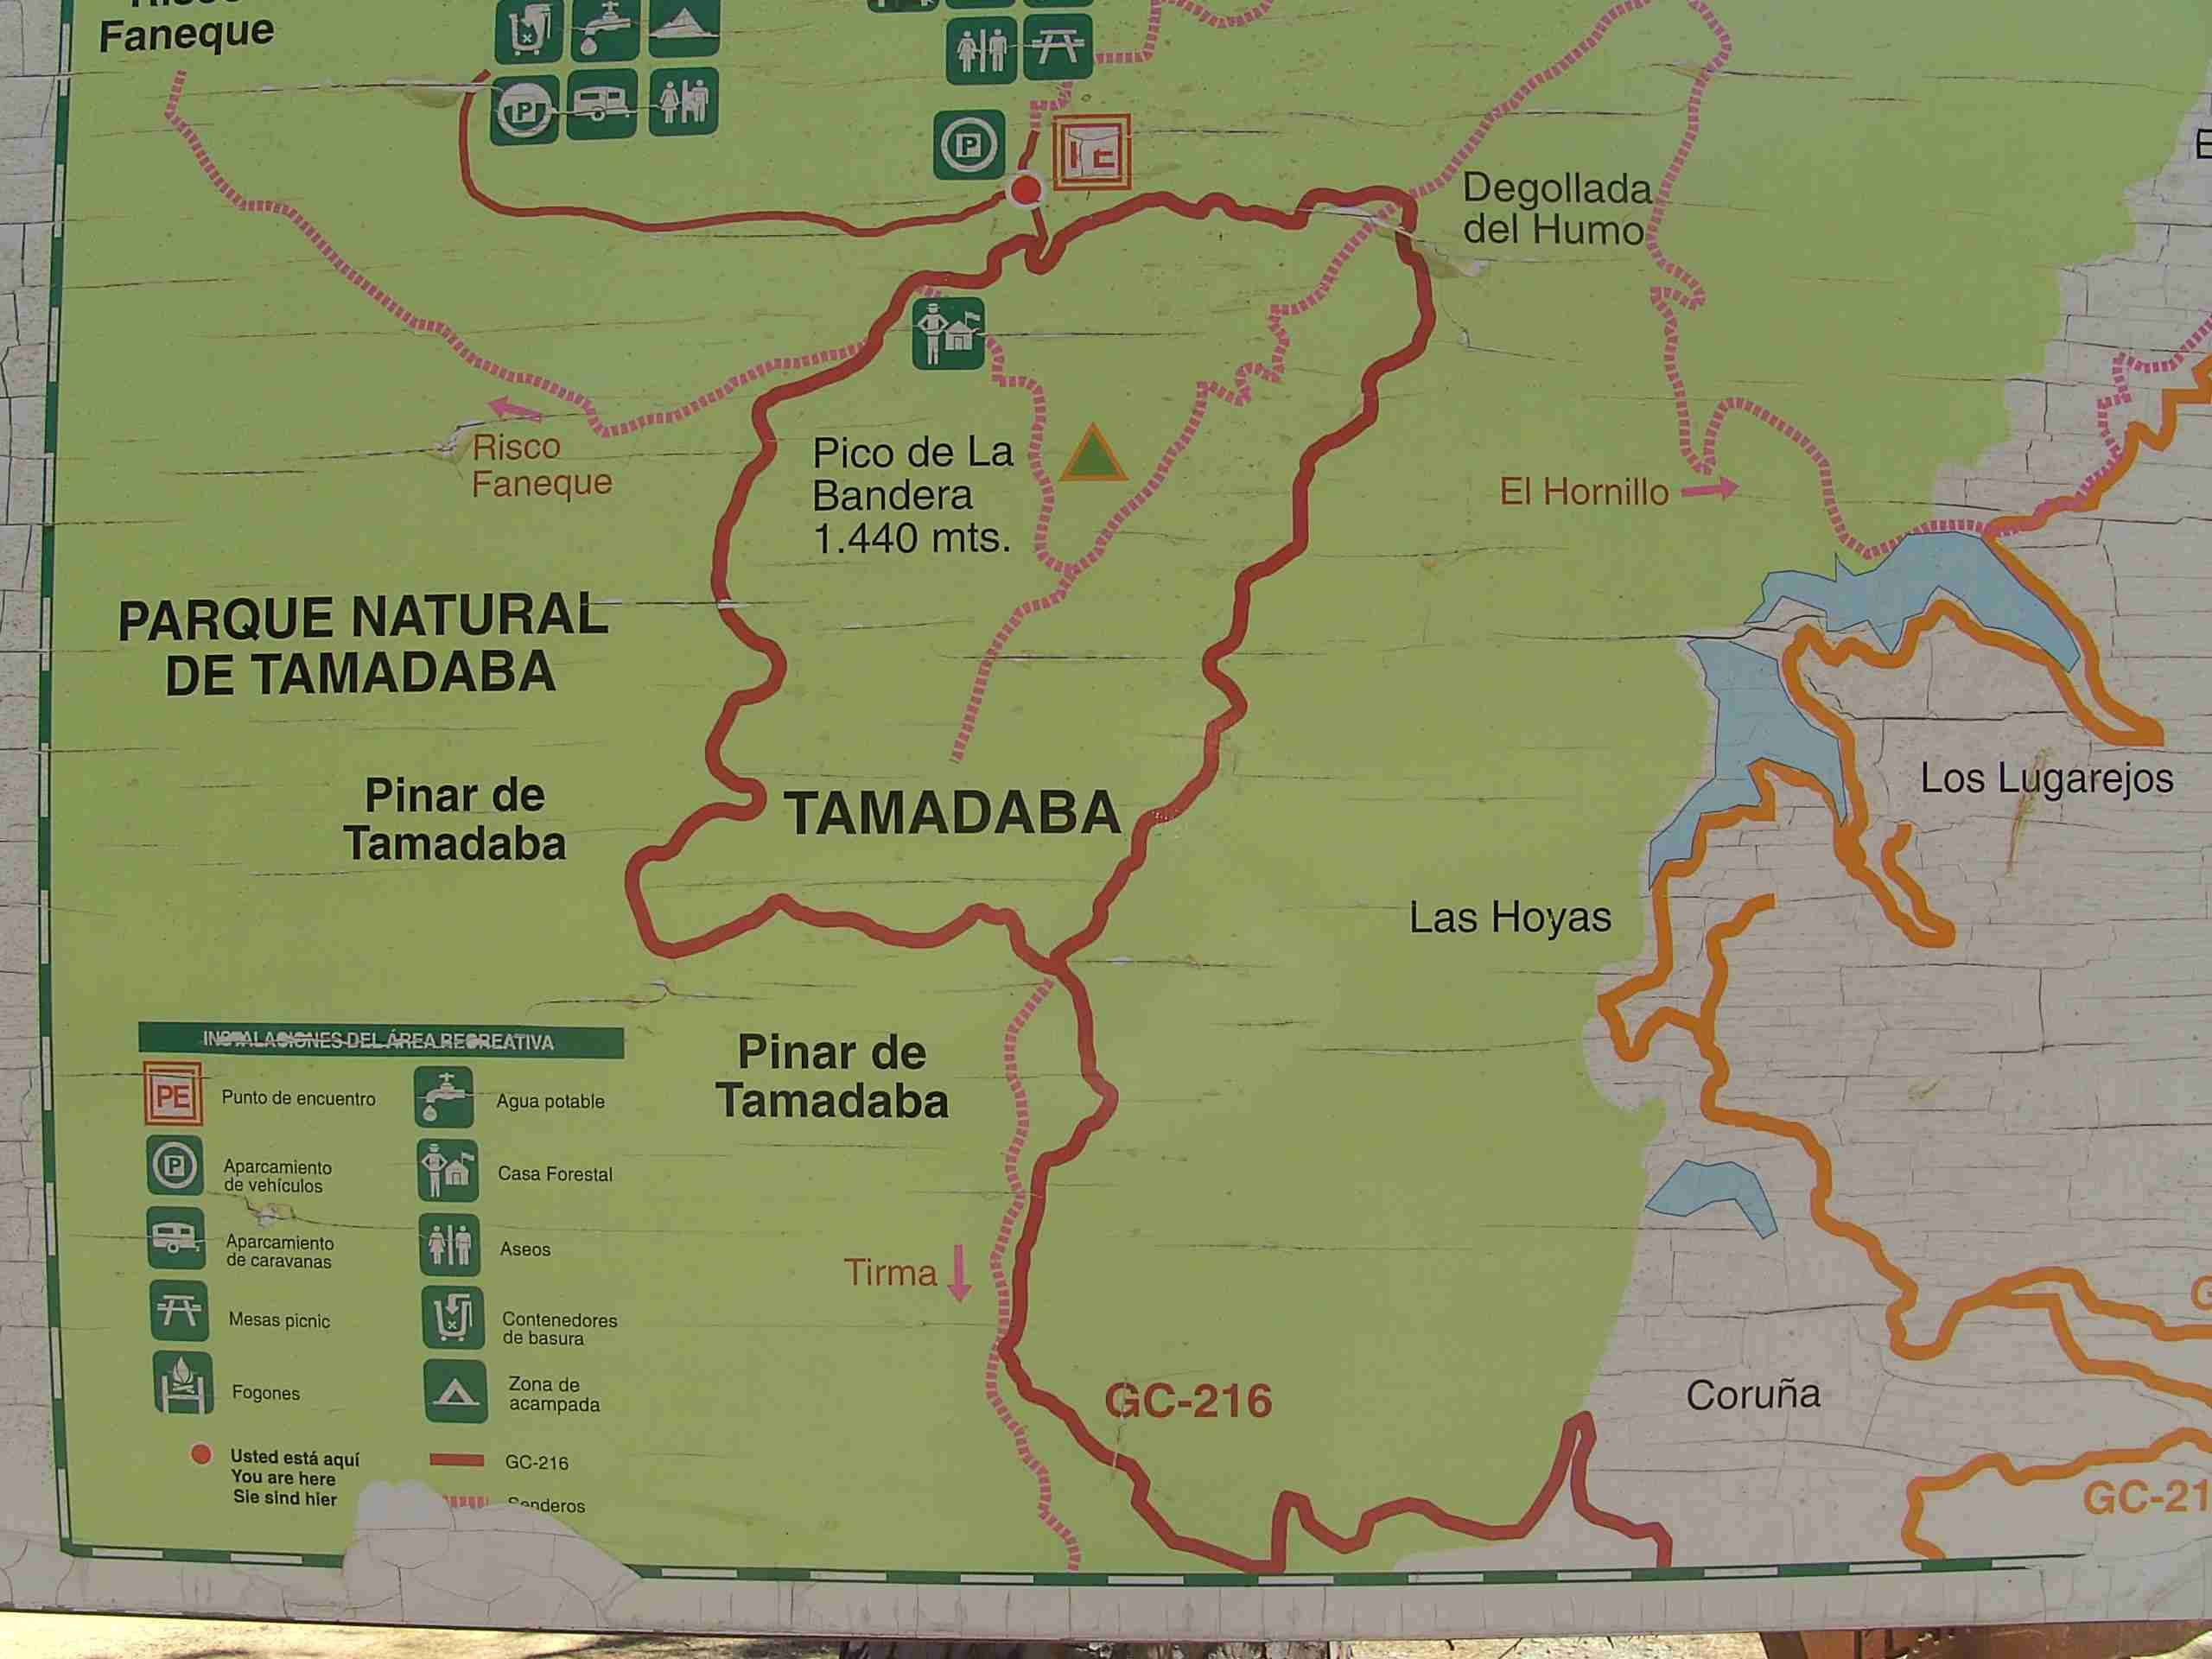 Kaartje Tamadaba